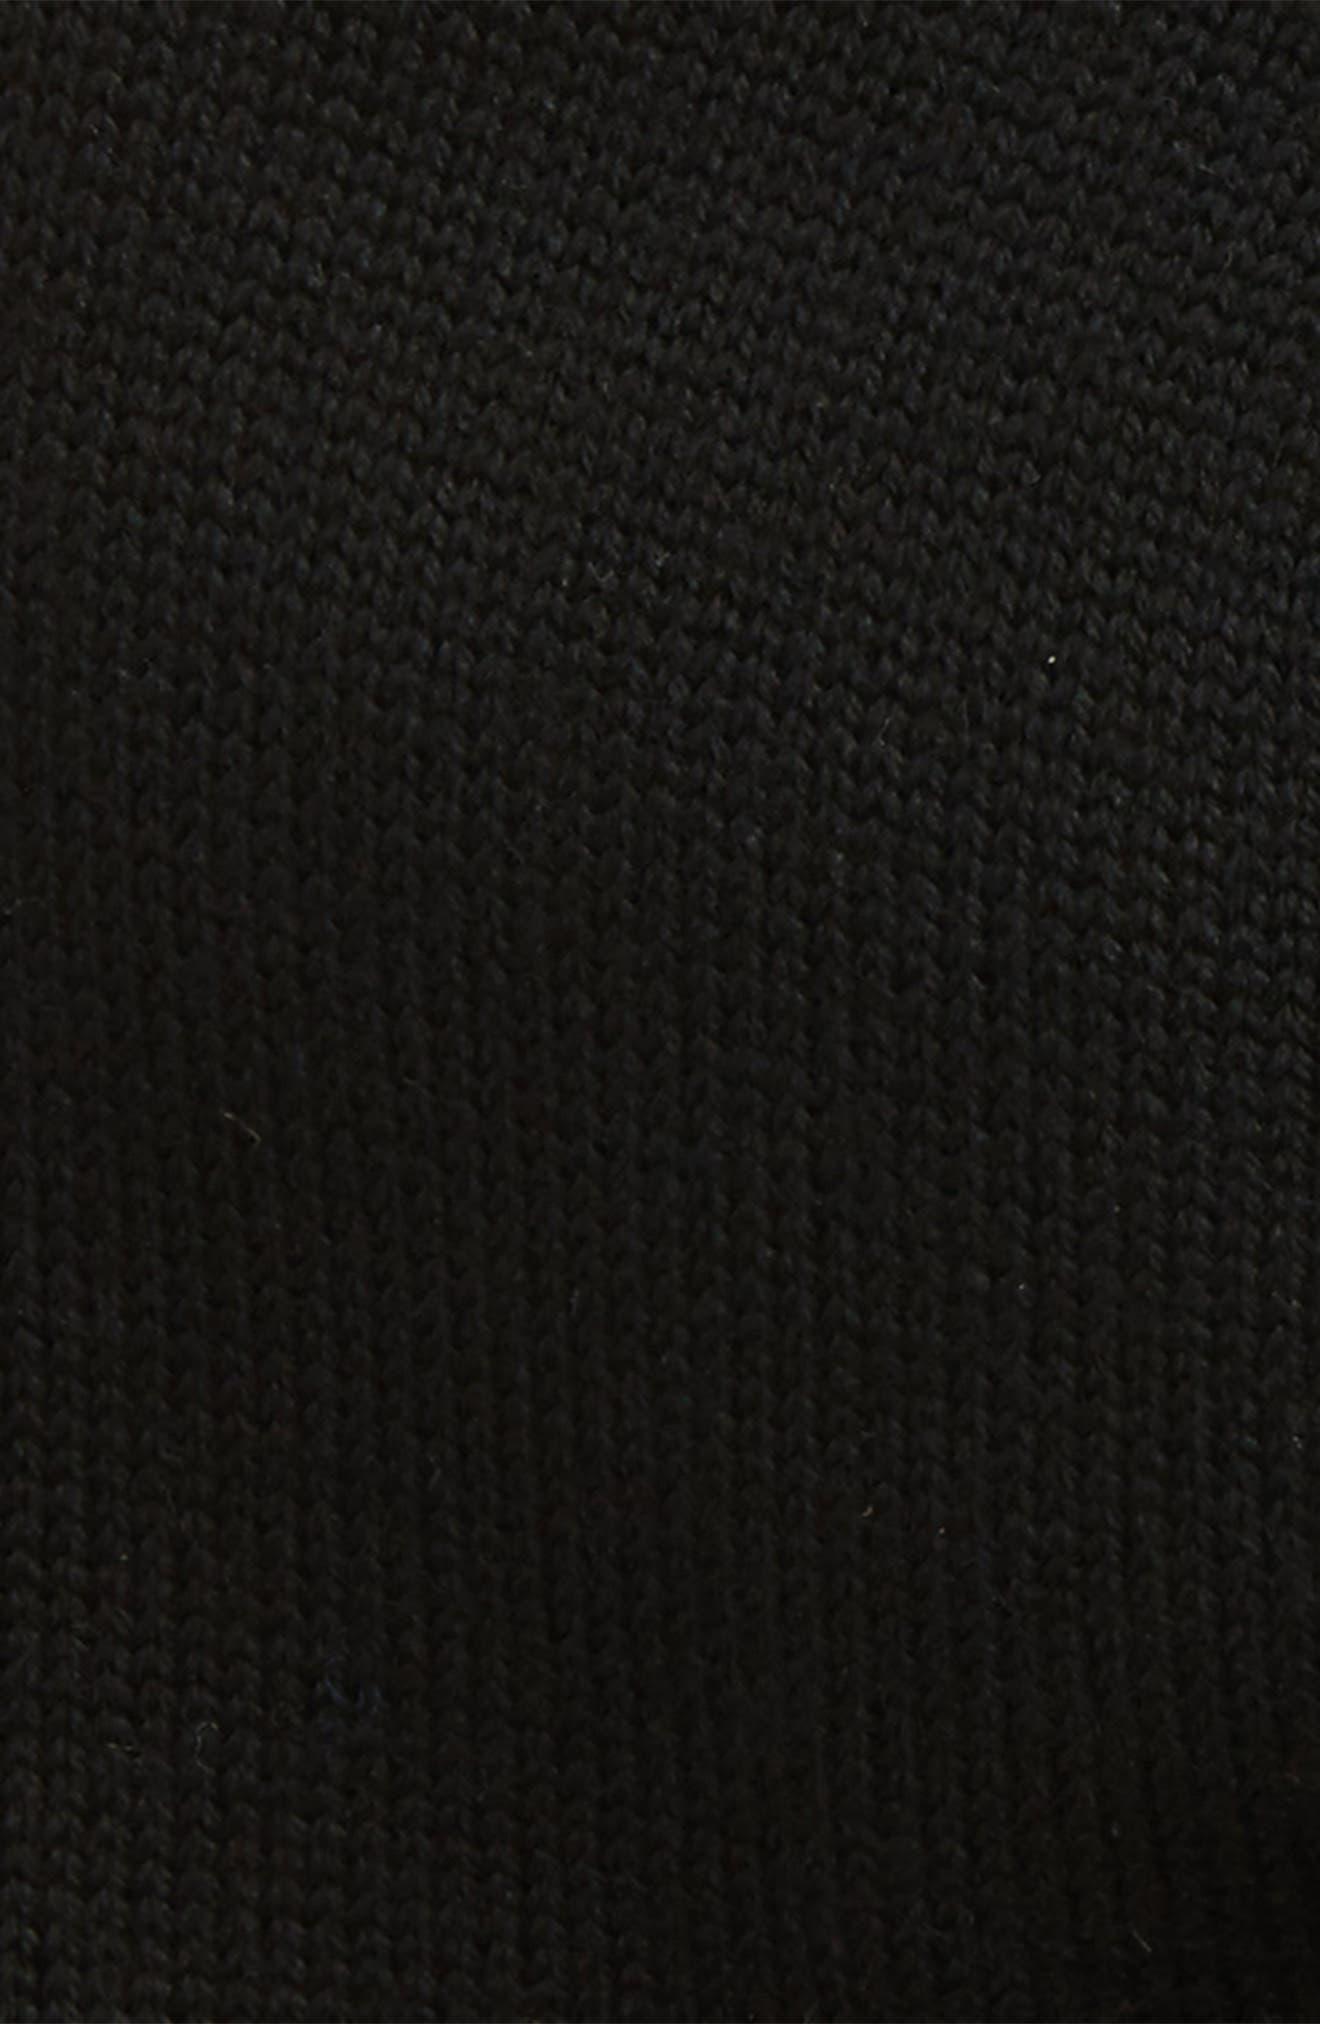 Jersey Knit Skull Cap,                             Alternate thumbnail 2, color,                             001